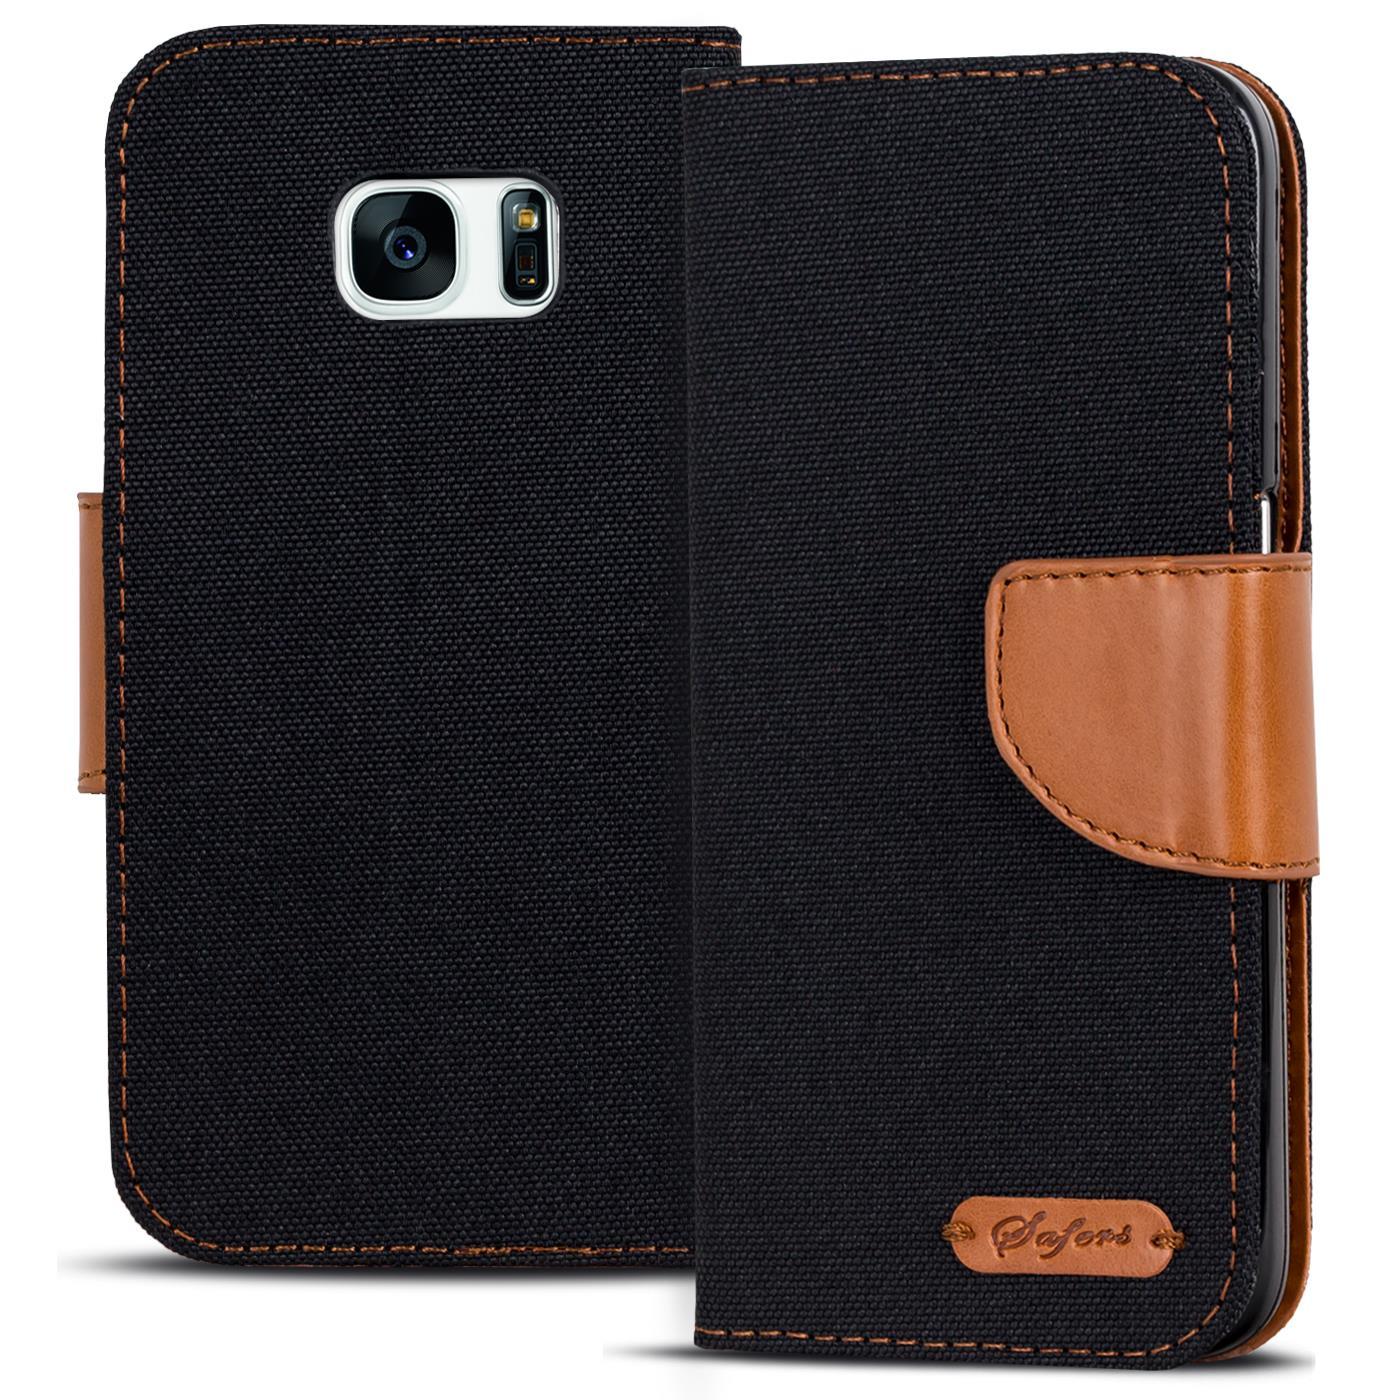 Schutzhülle Samsung Galaxy Hülle Flip Case Handy Tasche Klapphülle Book Cover